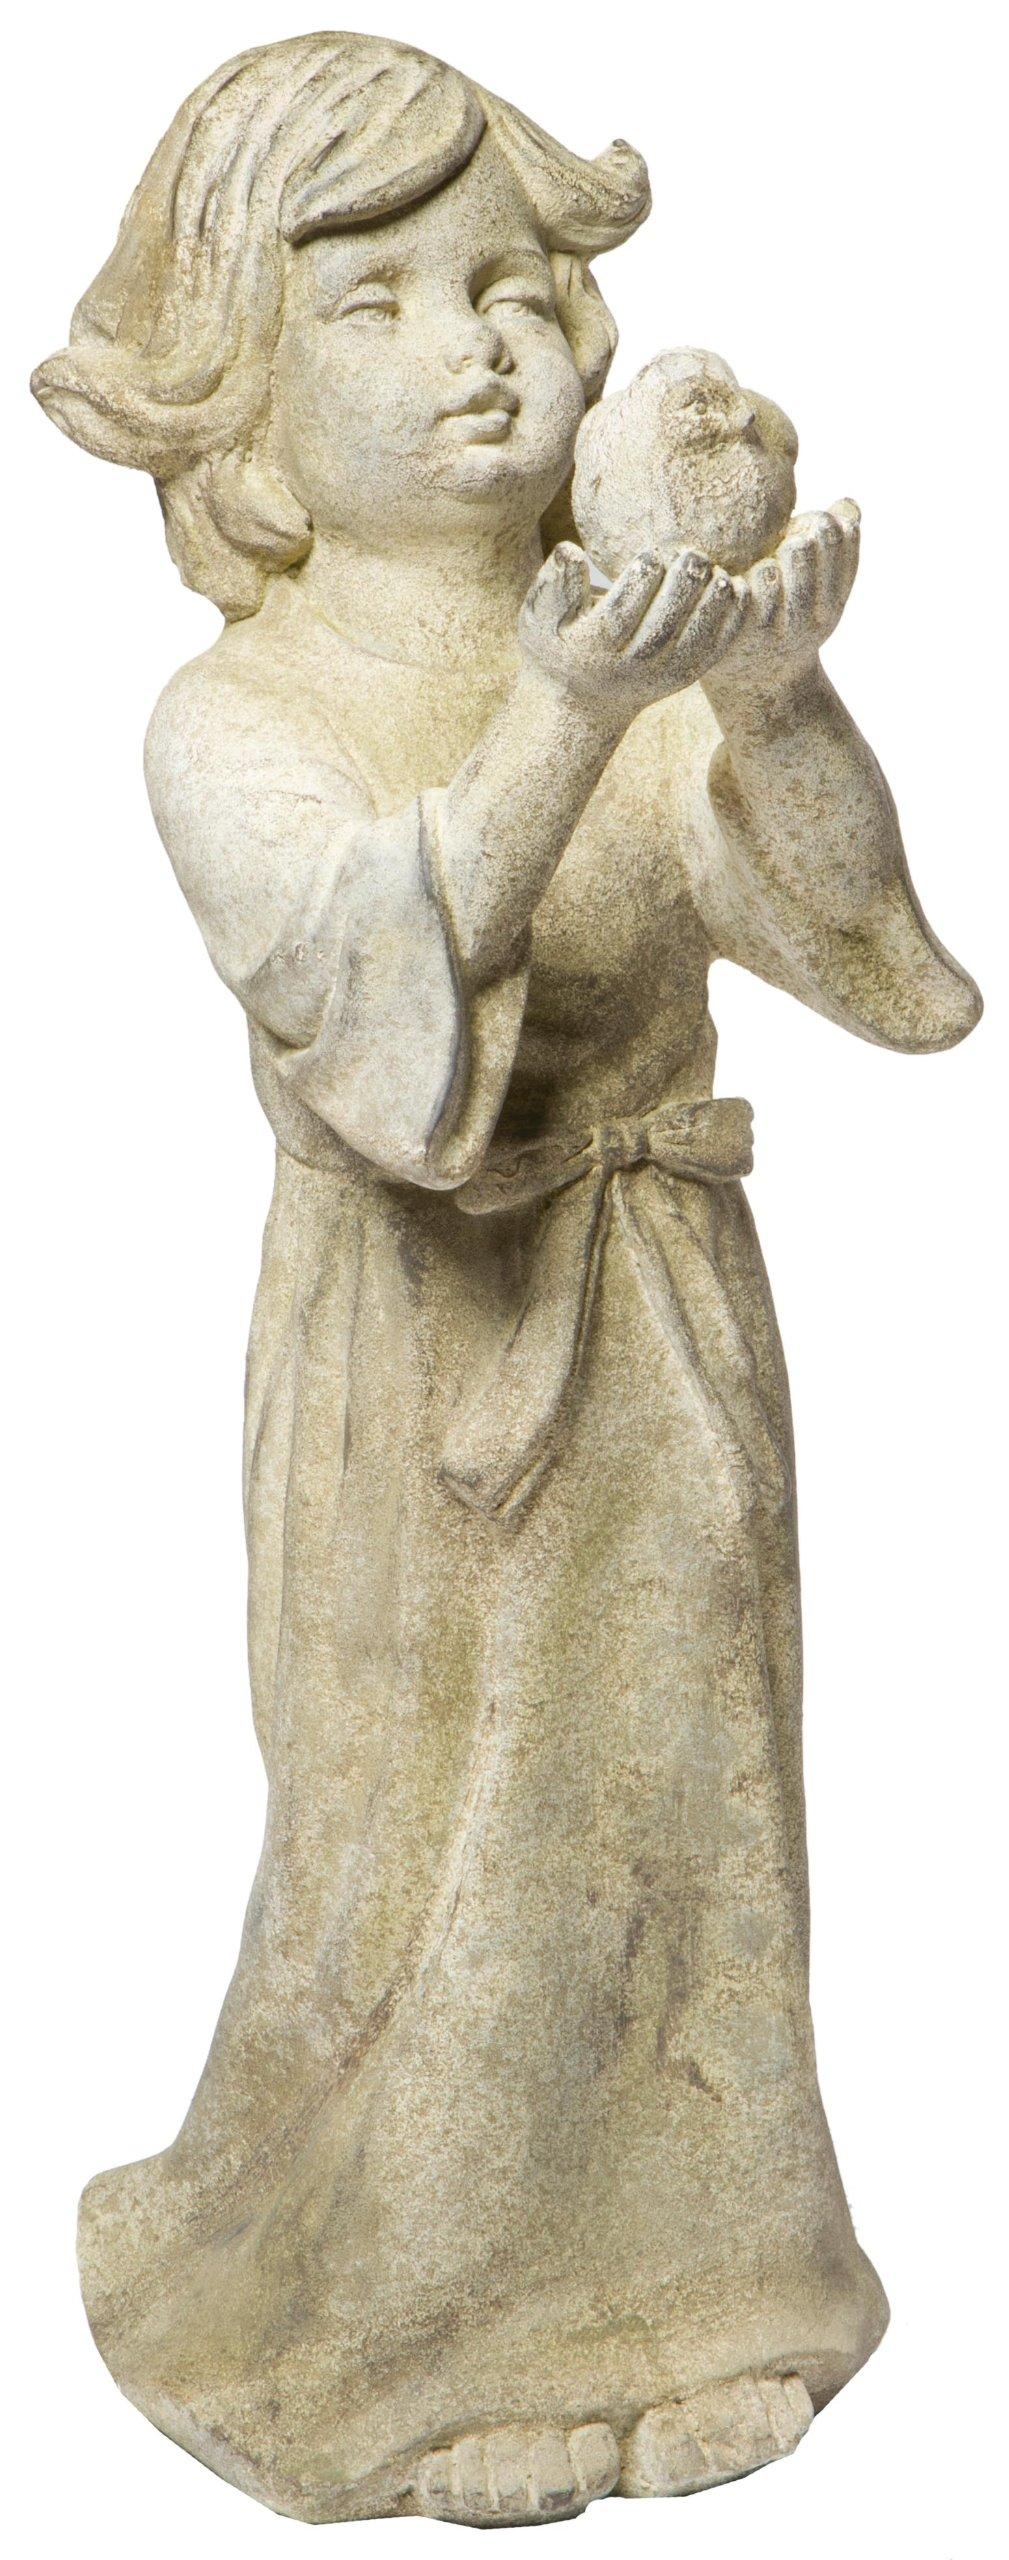 Alfresco Home Child Holding Bird Statuary, Aged Stone